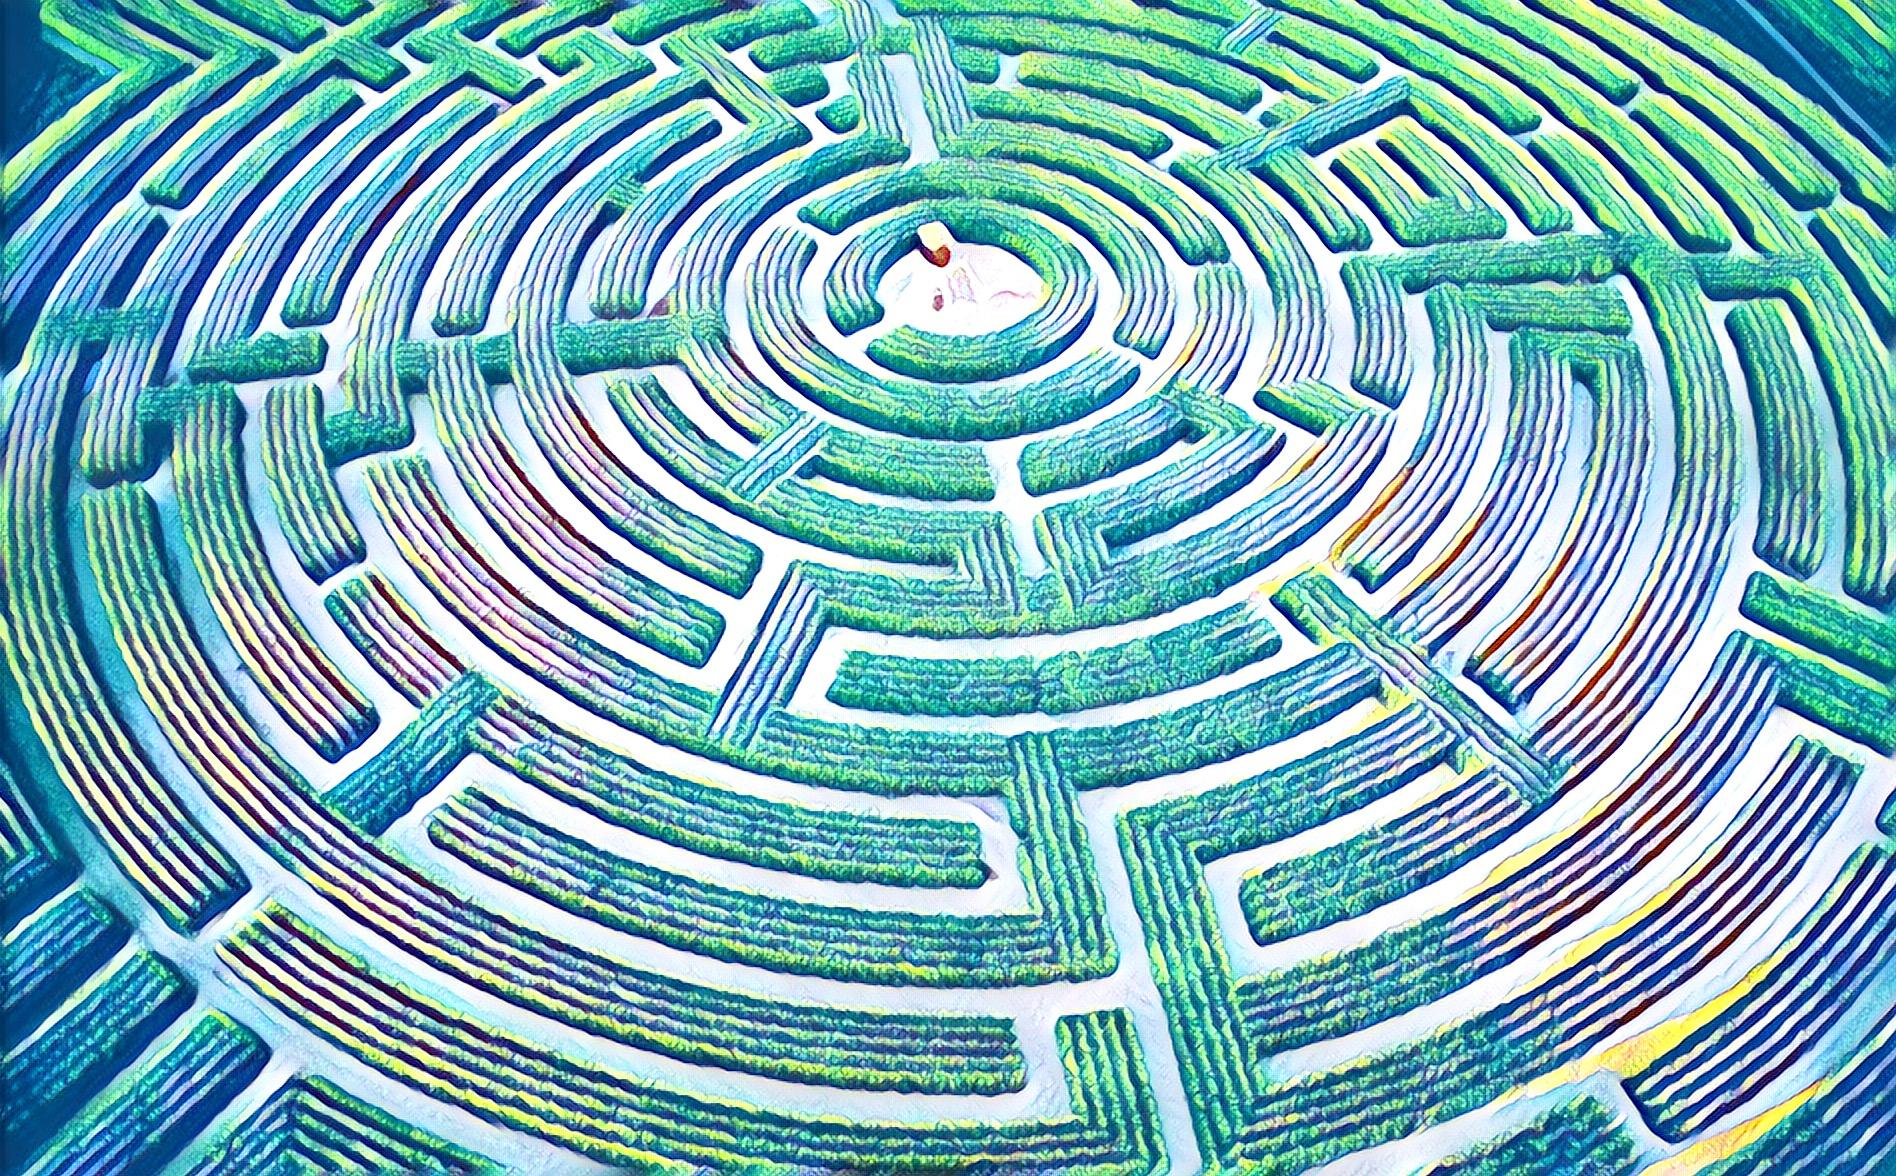 Training = Maze